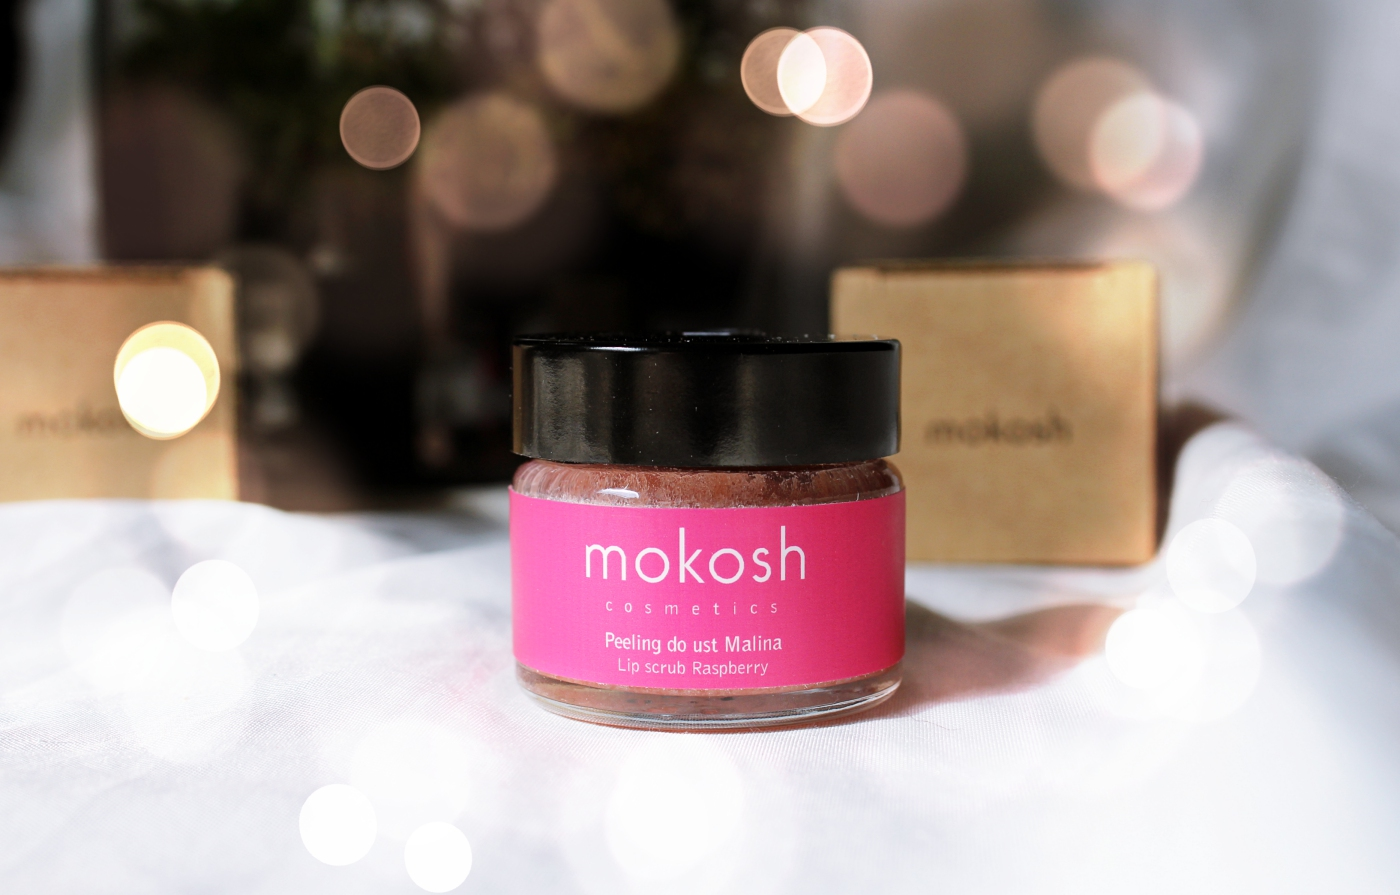 Peeling do ust Malina Mokosh Cosmetics opinie